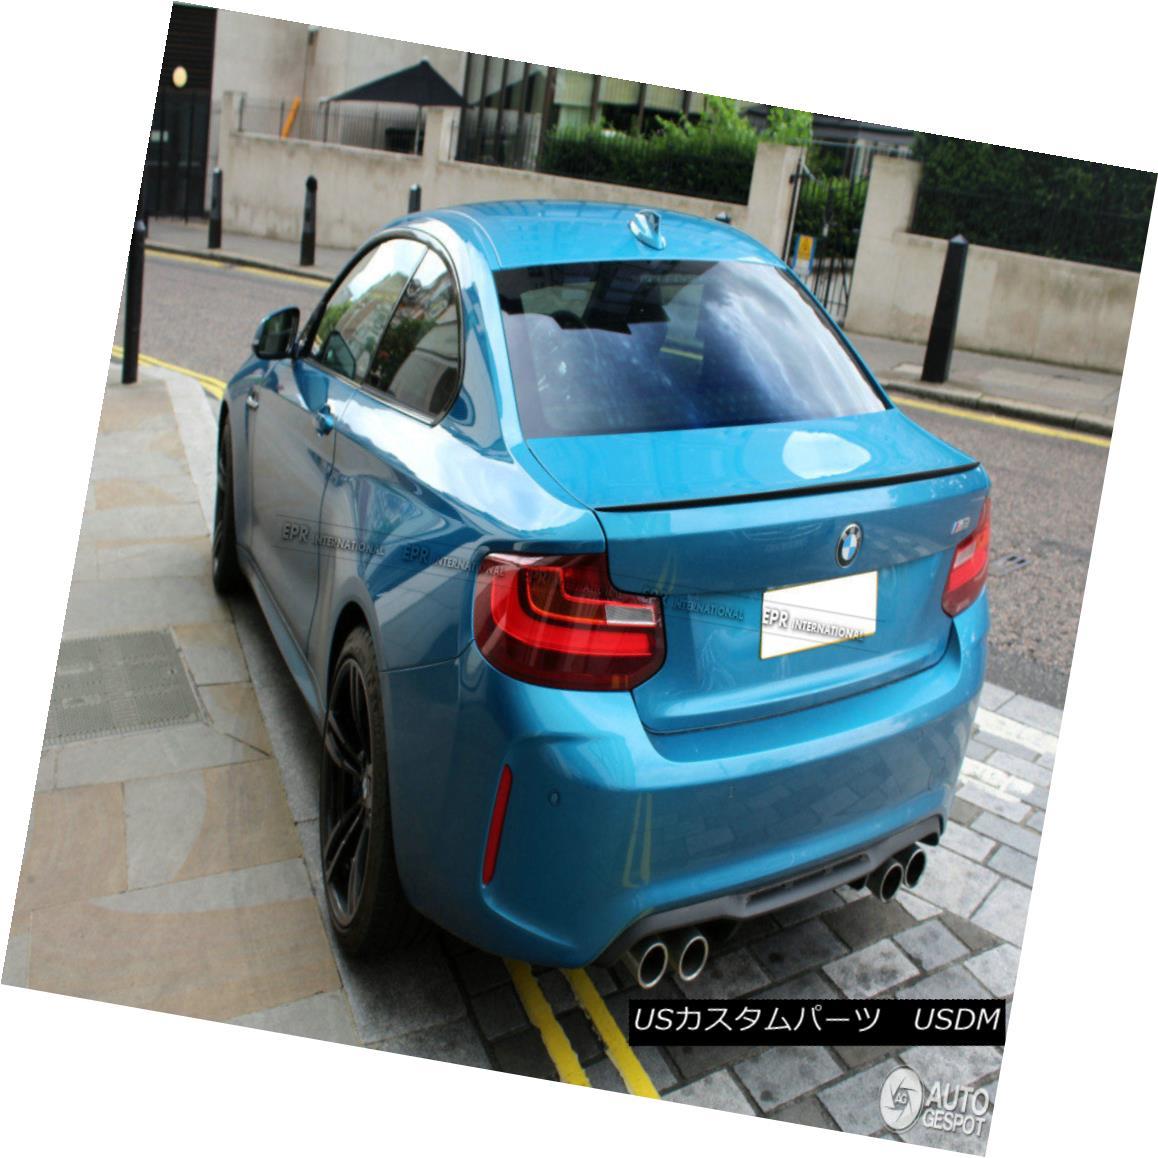 <title>車用品 バイク用品 >> パーツ 外装 エアロパーツ リアスポイラー For BMW 2 Series F22 M2 Style 14-17 5%OFF Carbon Fiber Rear Ducktail Spoiler Wing Part 2シリーズF22 M2スタイル14-17カーボンファイバーリアダックテールスポイラーウイングパーツ</title>